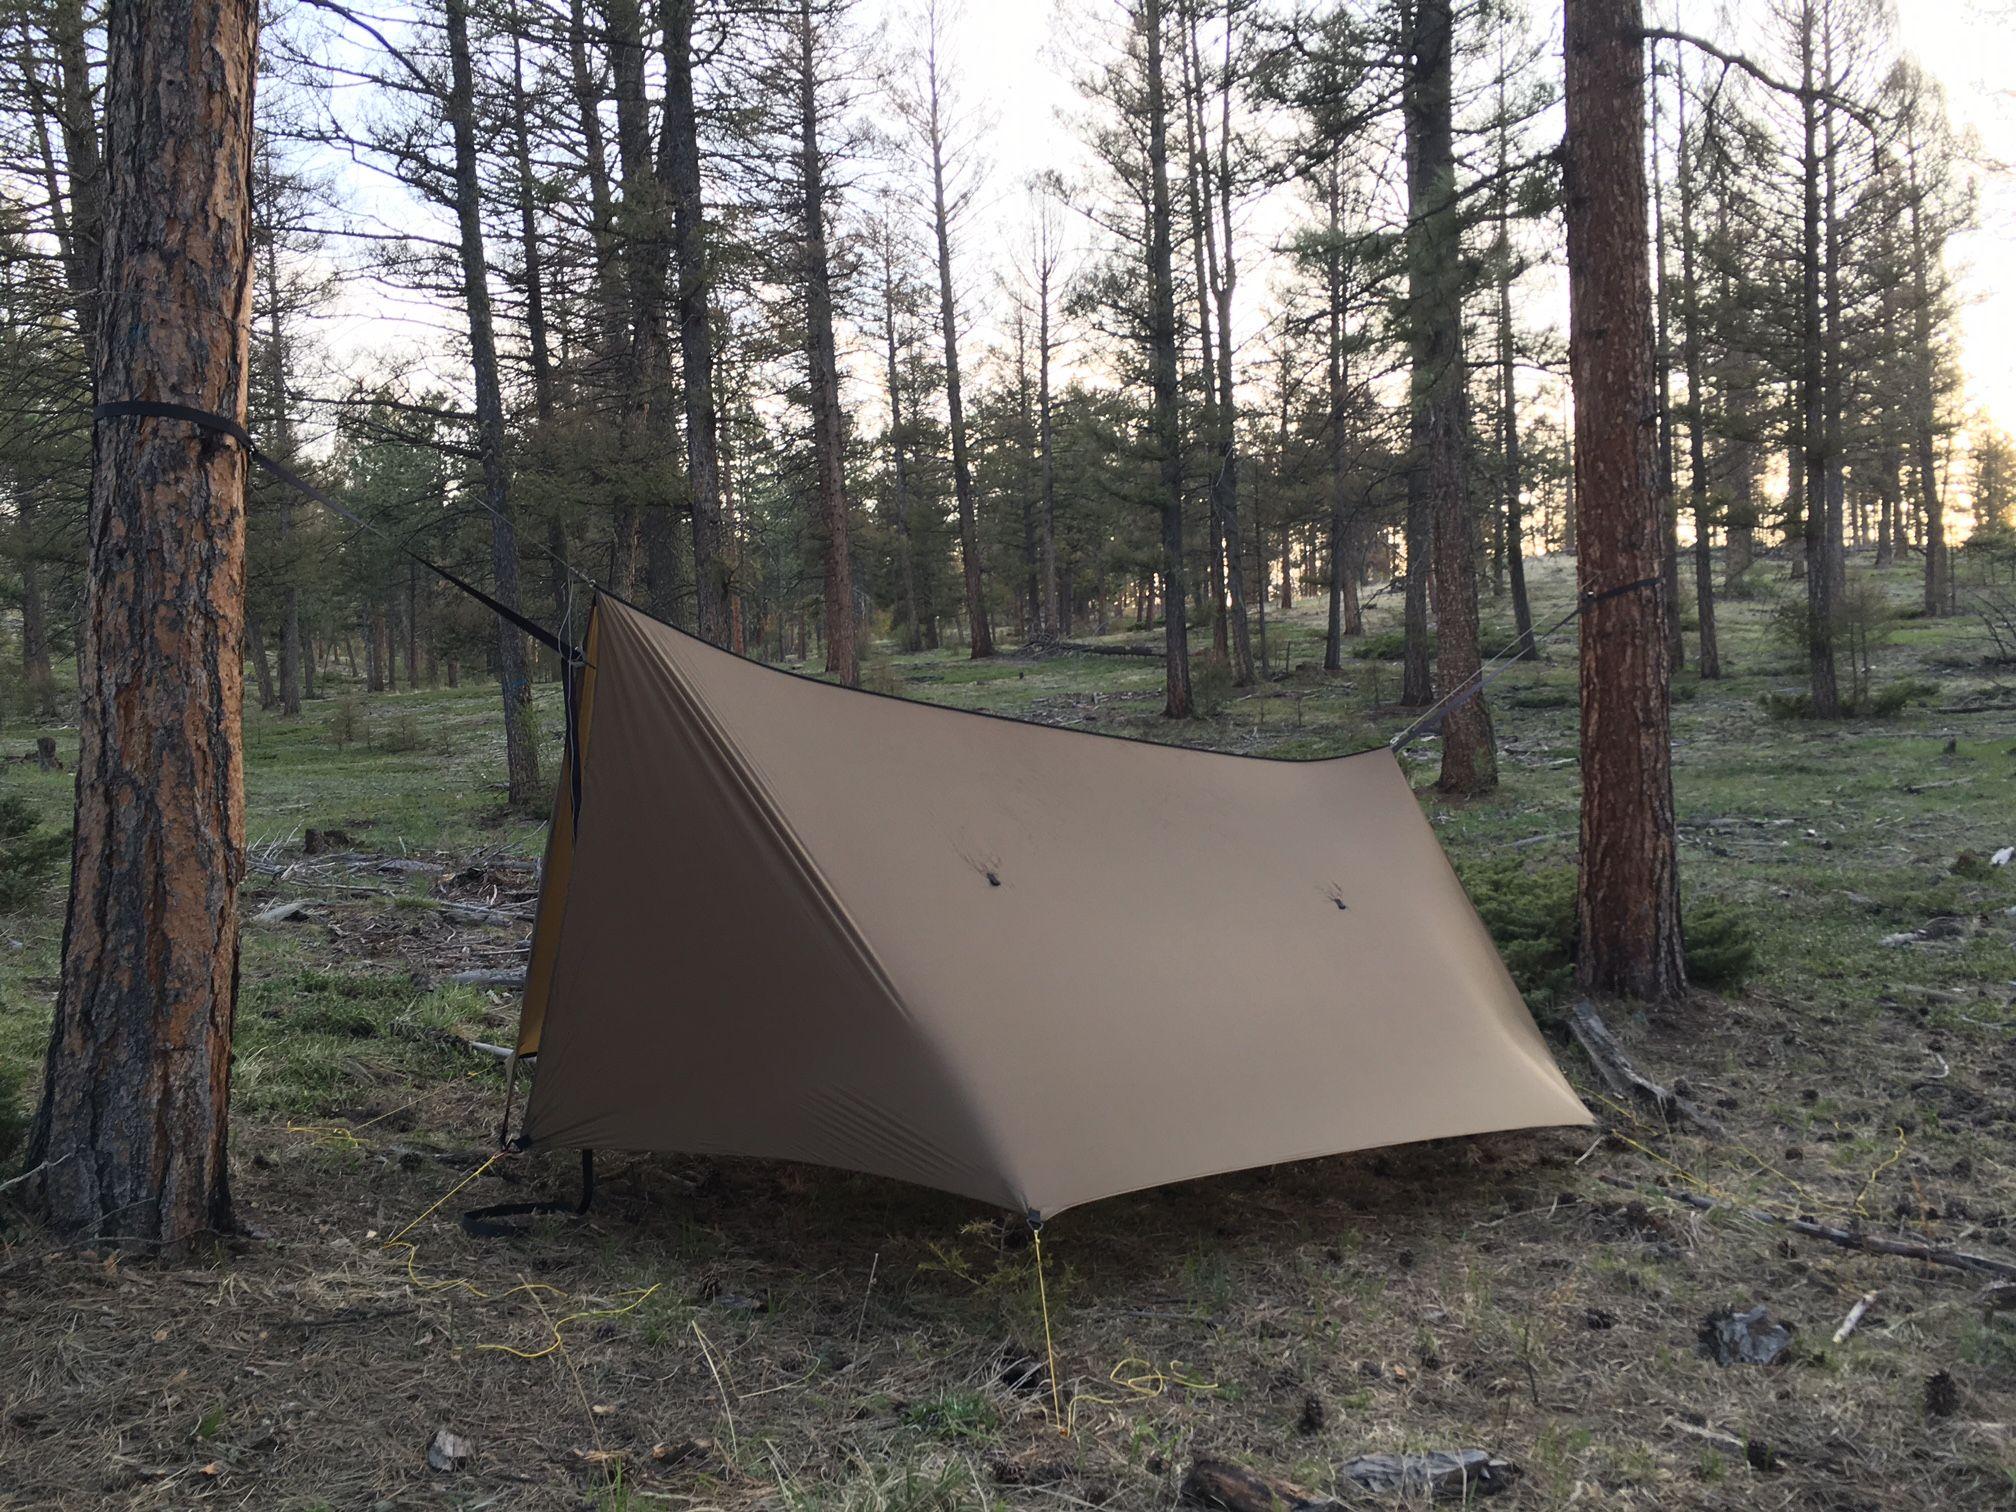 Superfly tarp survival thingies pinterest large tarps hammock